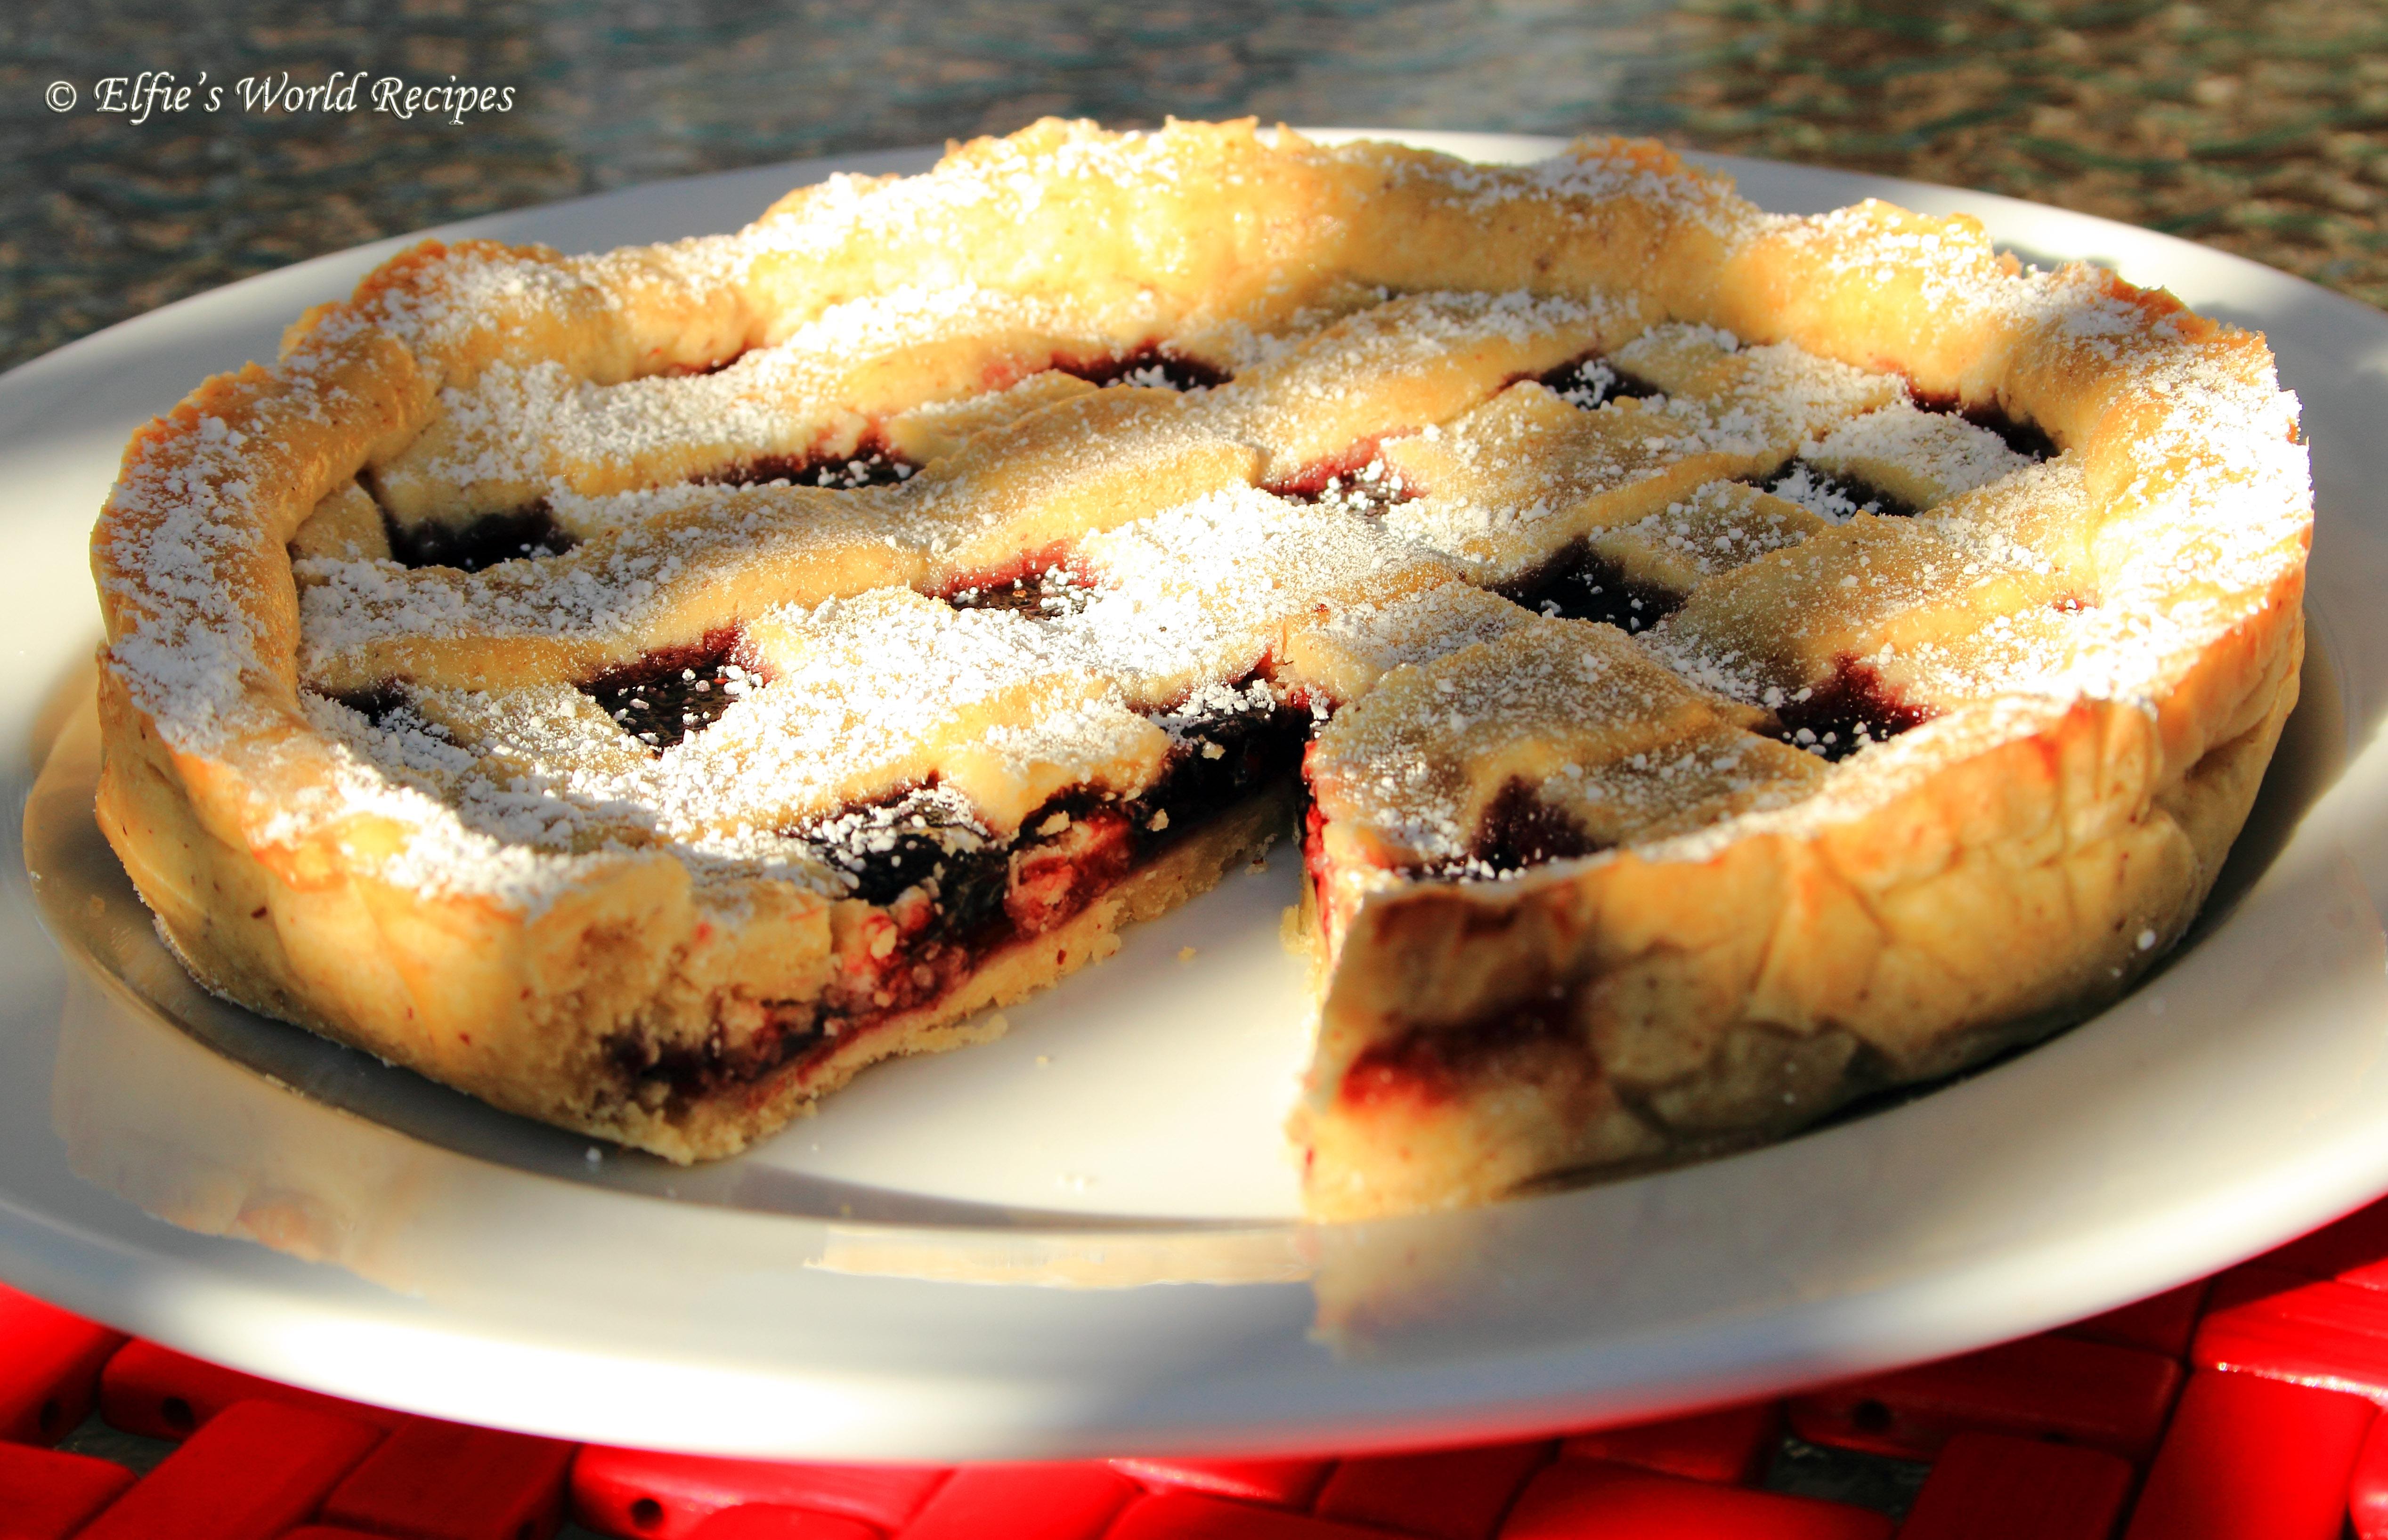 Crostata di Prugna – Prune or Plum Jam Tart | Elfie's ...